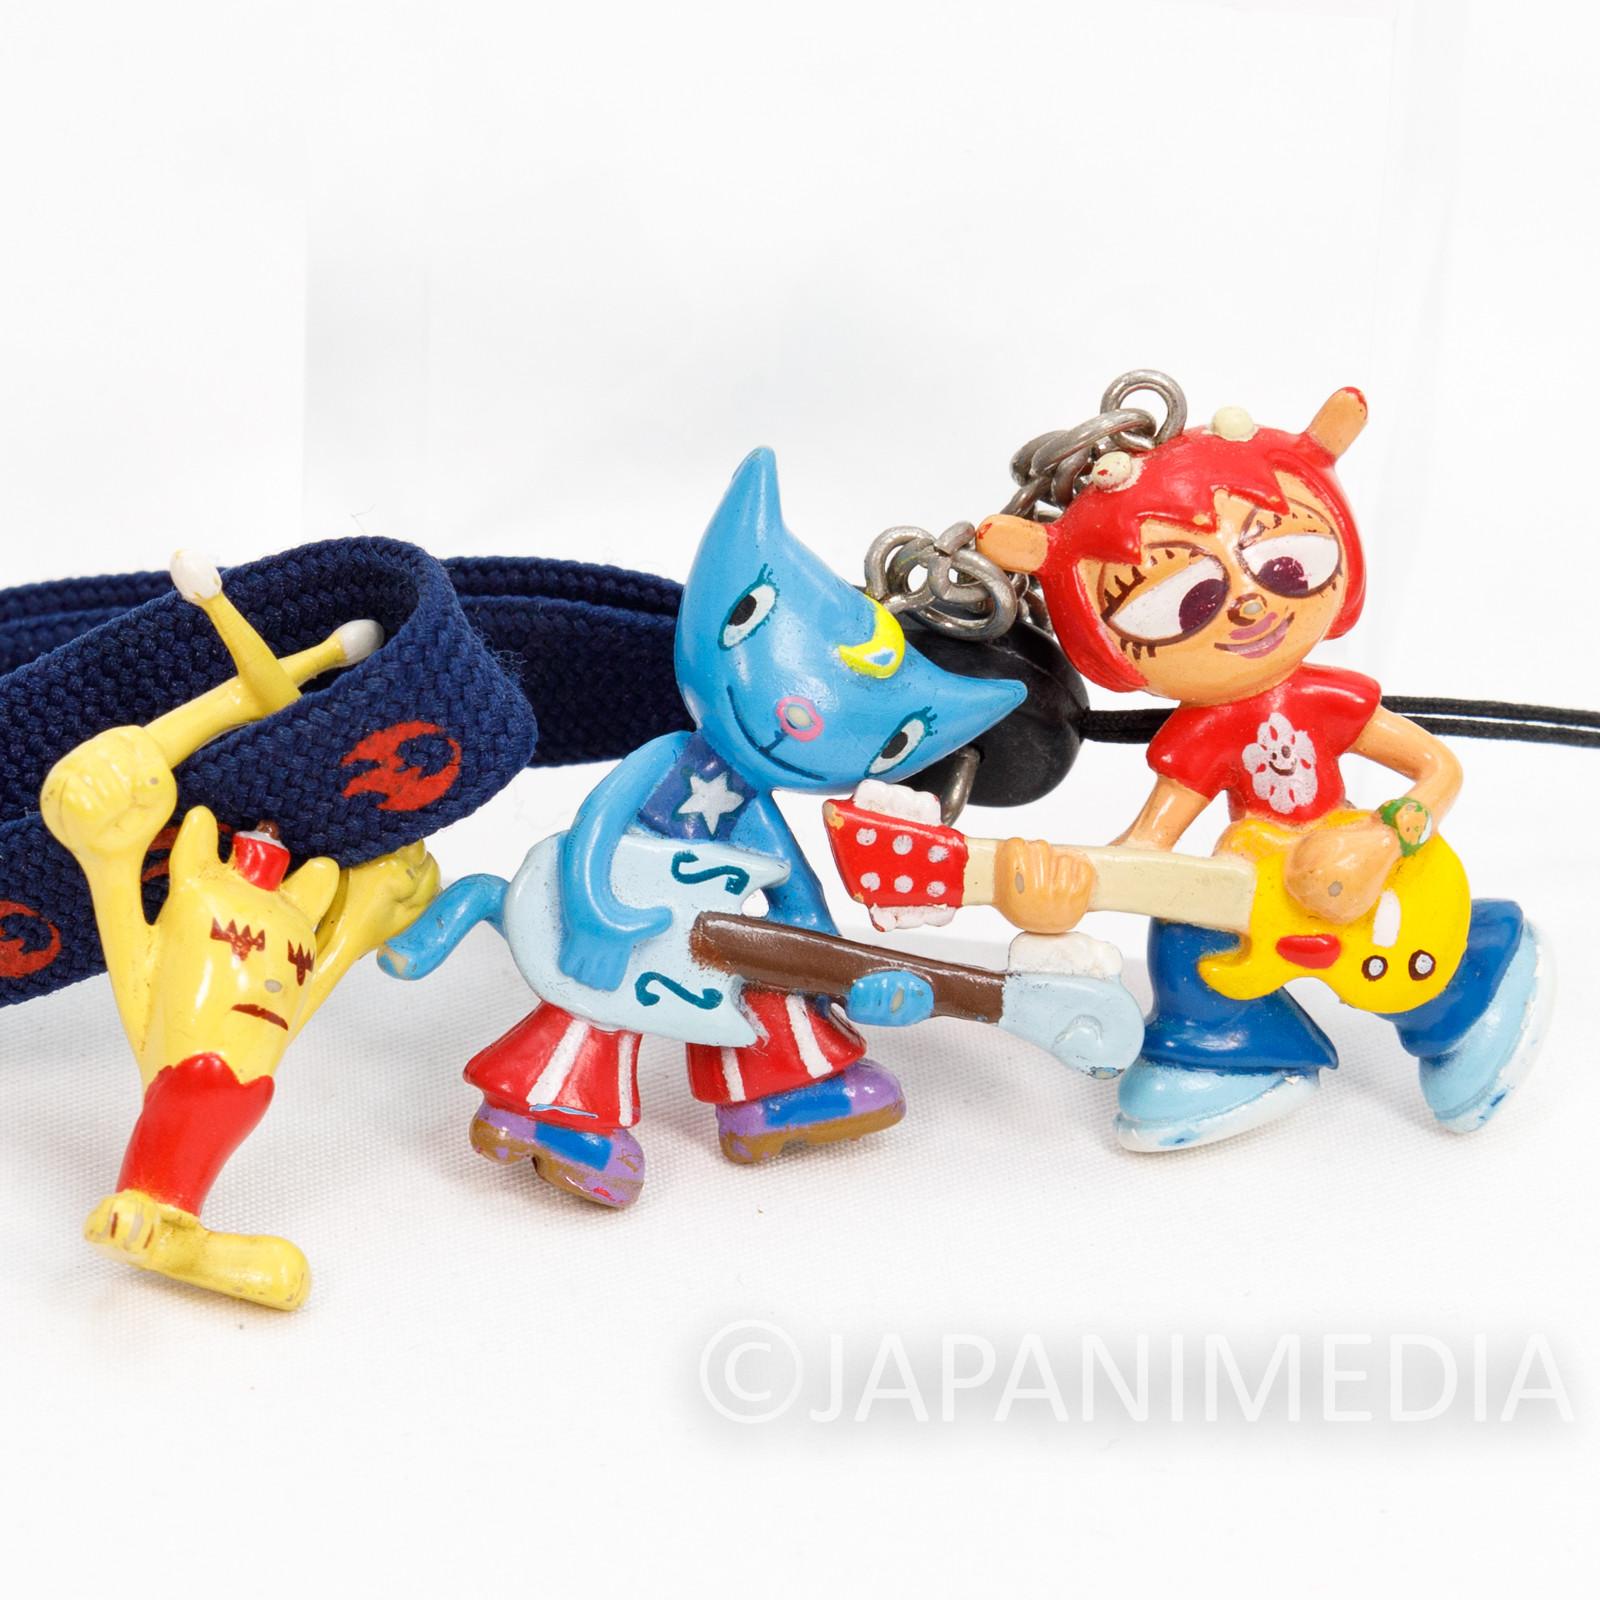 UmJammer Lammy Figure Strap JAPAN GAME USED